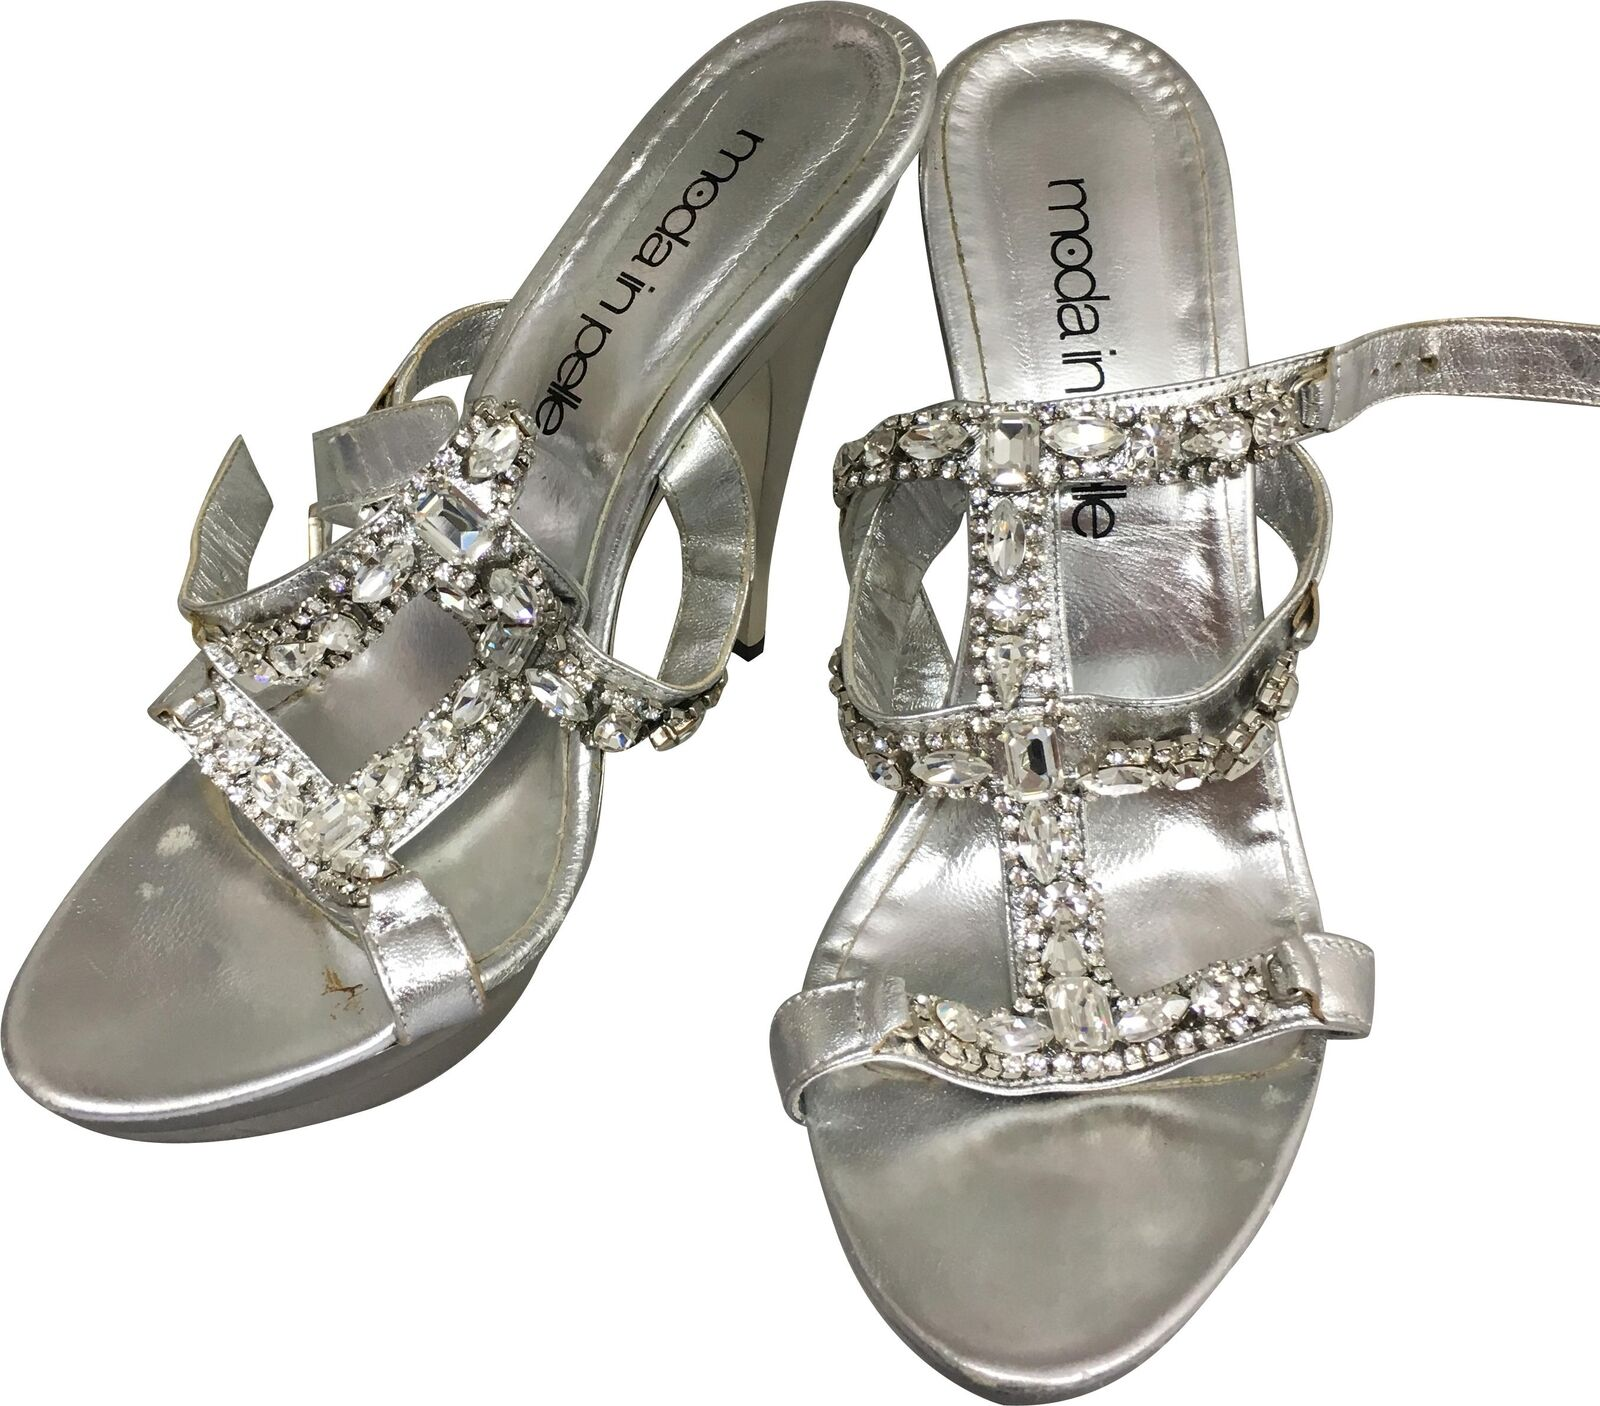 PRE-OWNED Ladies Moda In Pelle Silver Diamante 5.5In Heel Shoes Size 39 JB230